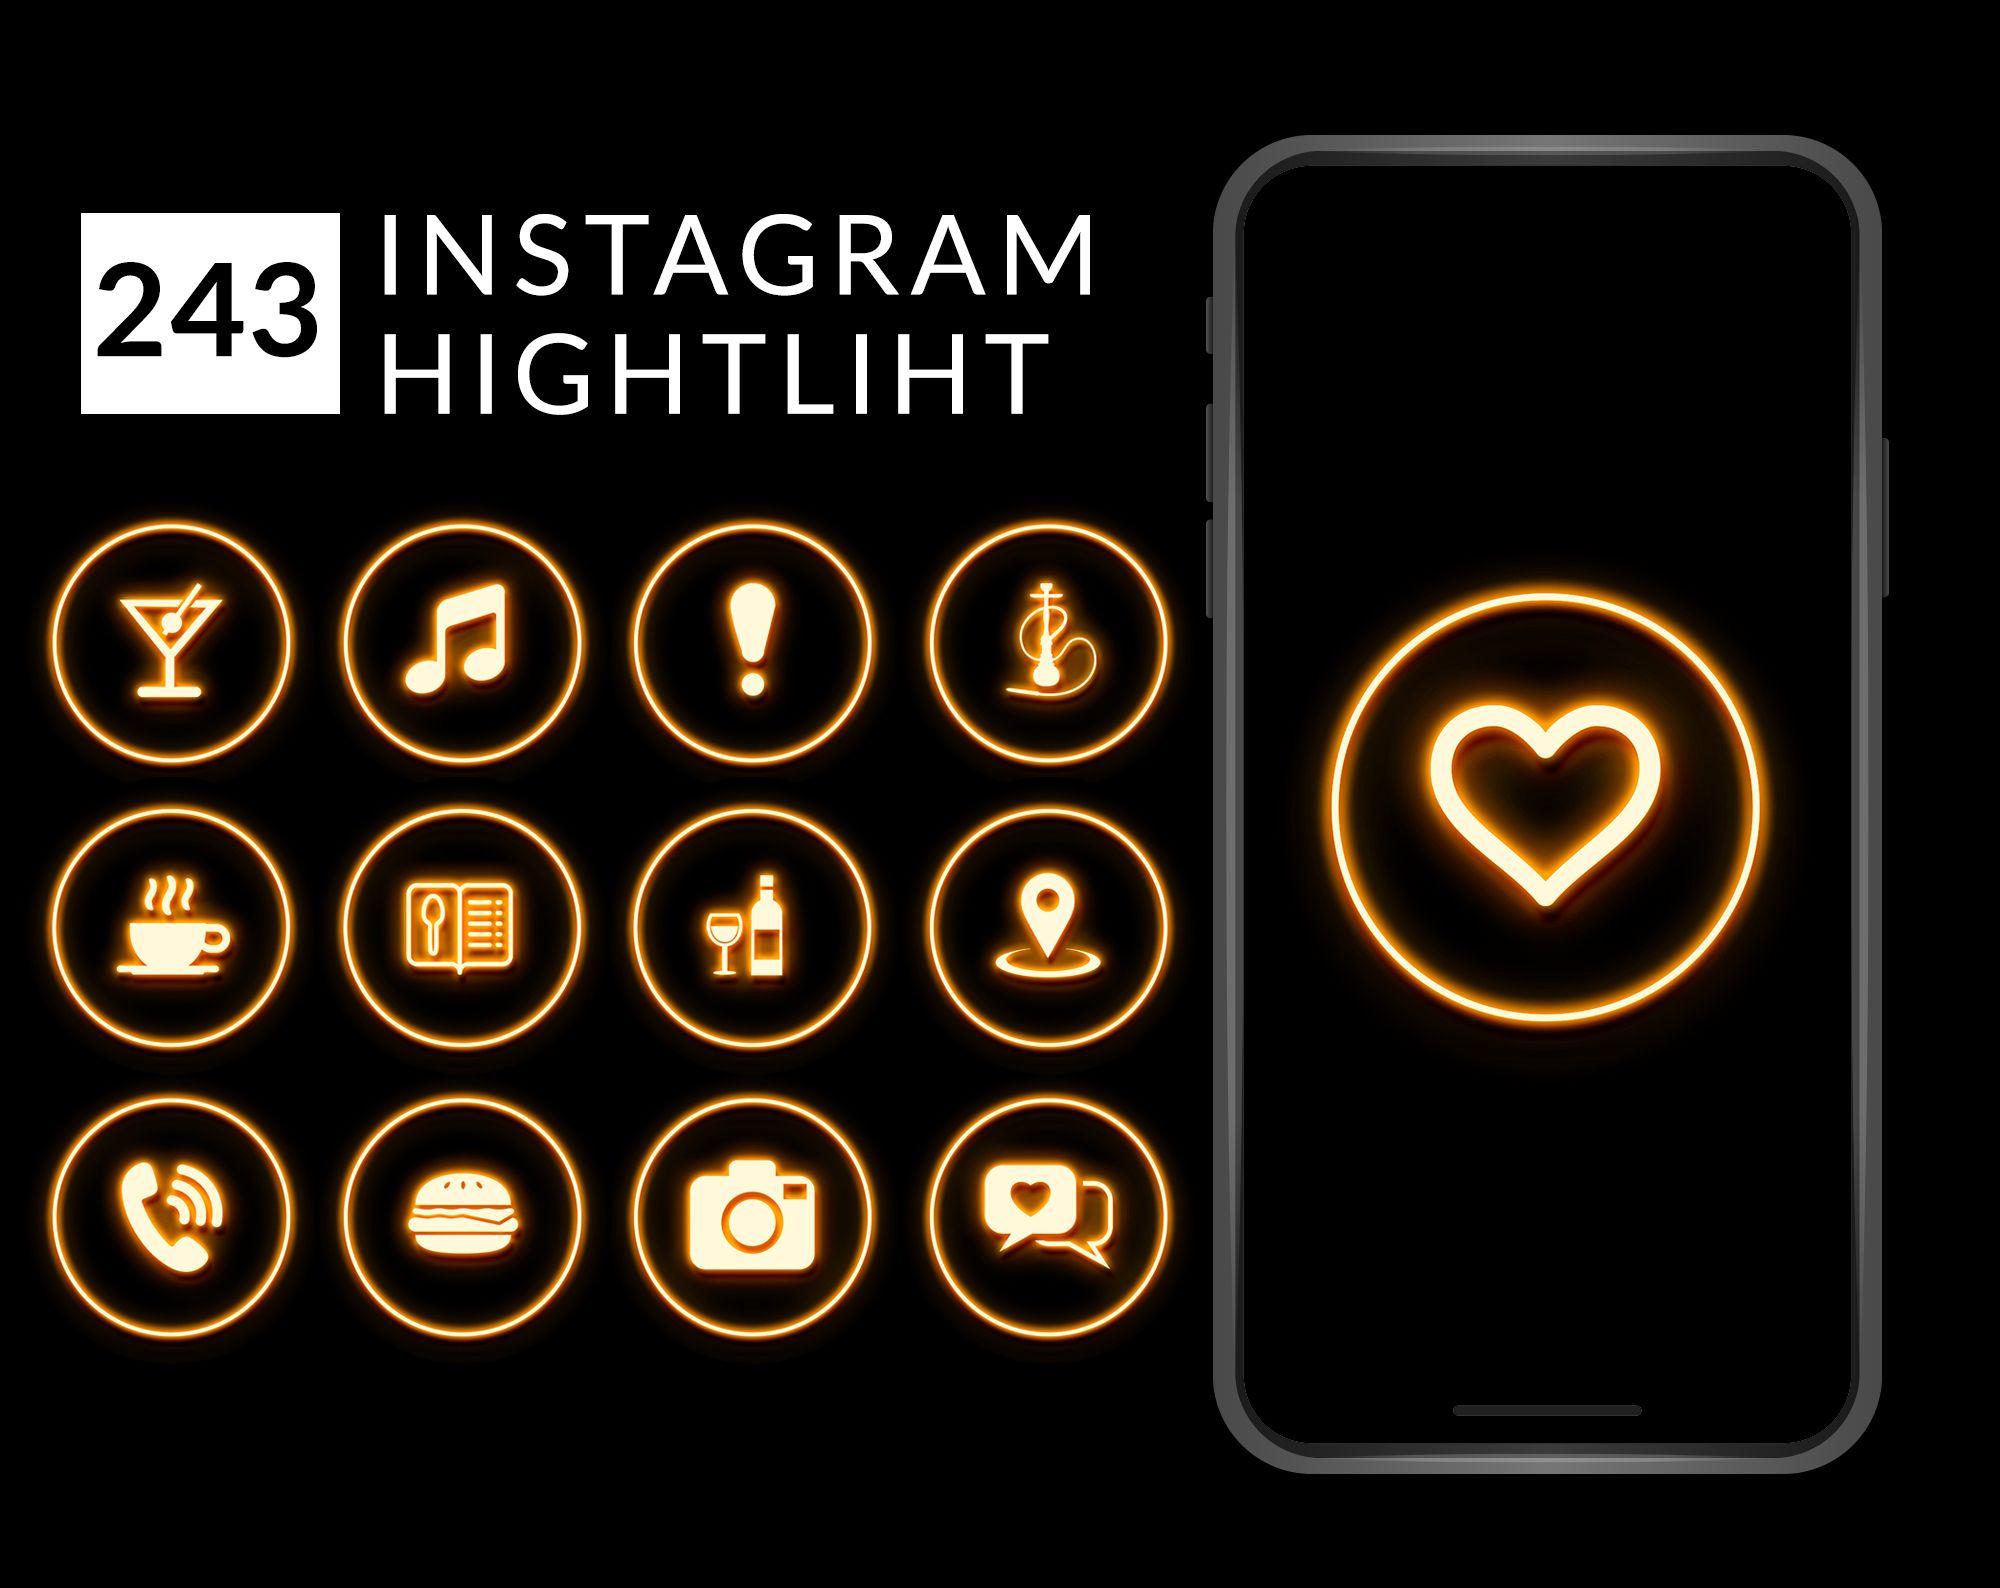 Yellow Orange Neon Highlight Covers Instagram Highlight Icons Etsy In 2020 Instagram Highlight Icons Instagram Design Cafe Icon